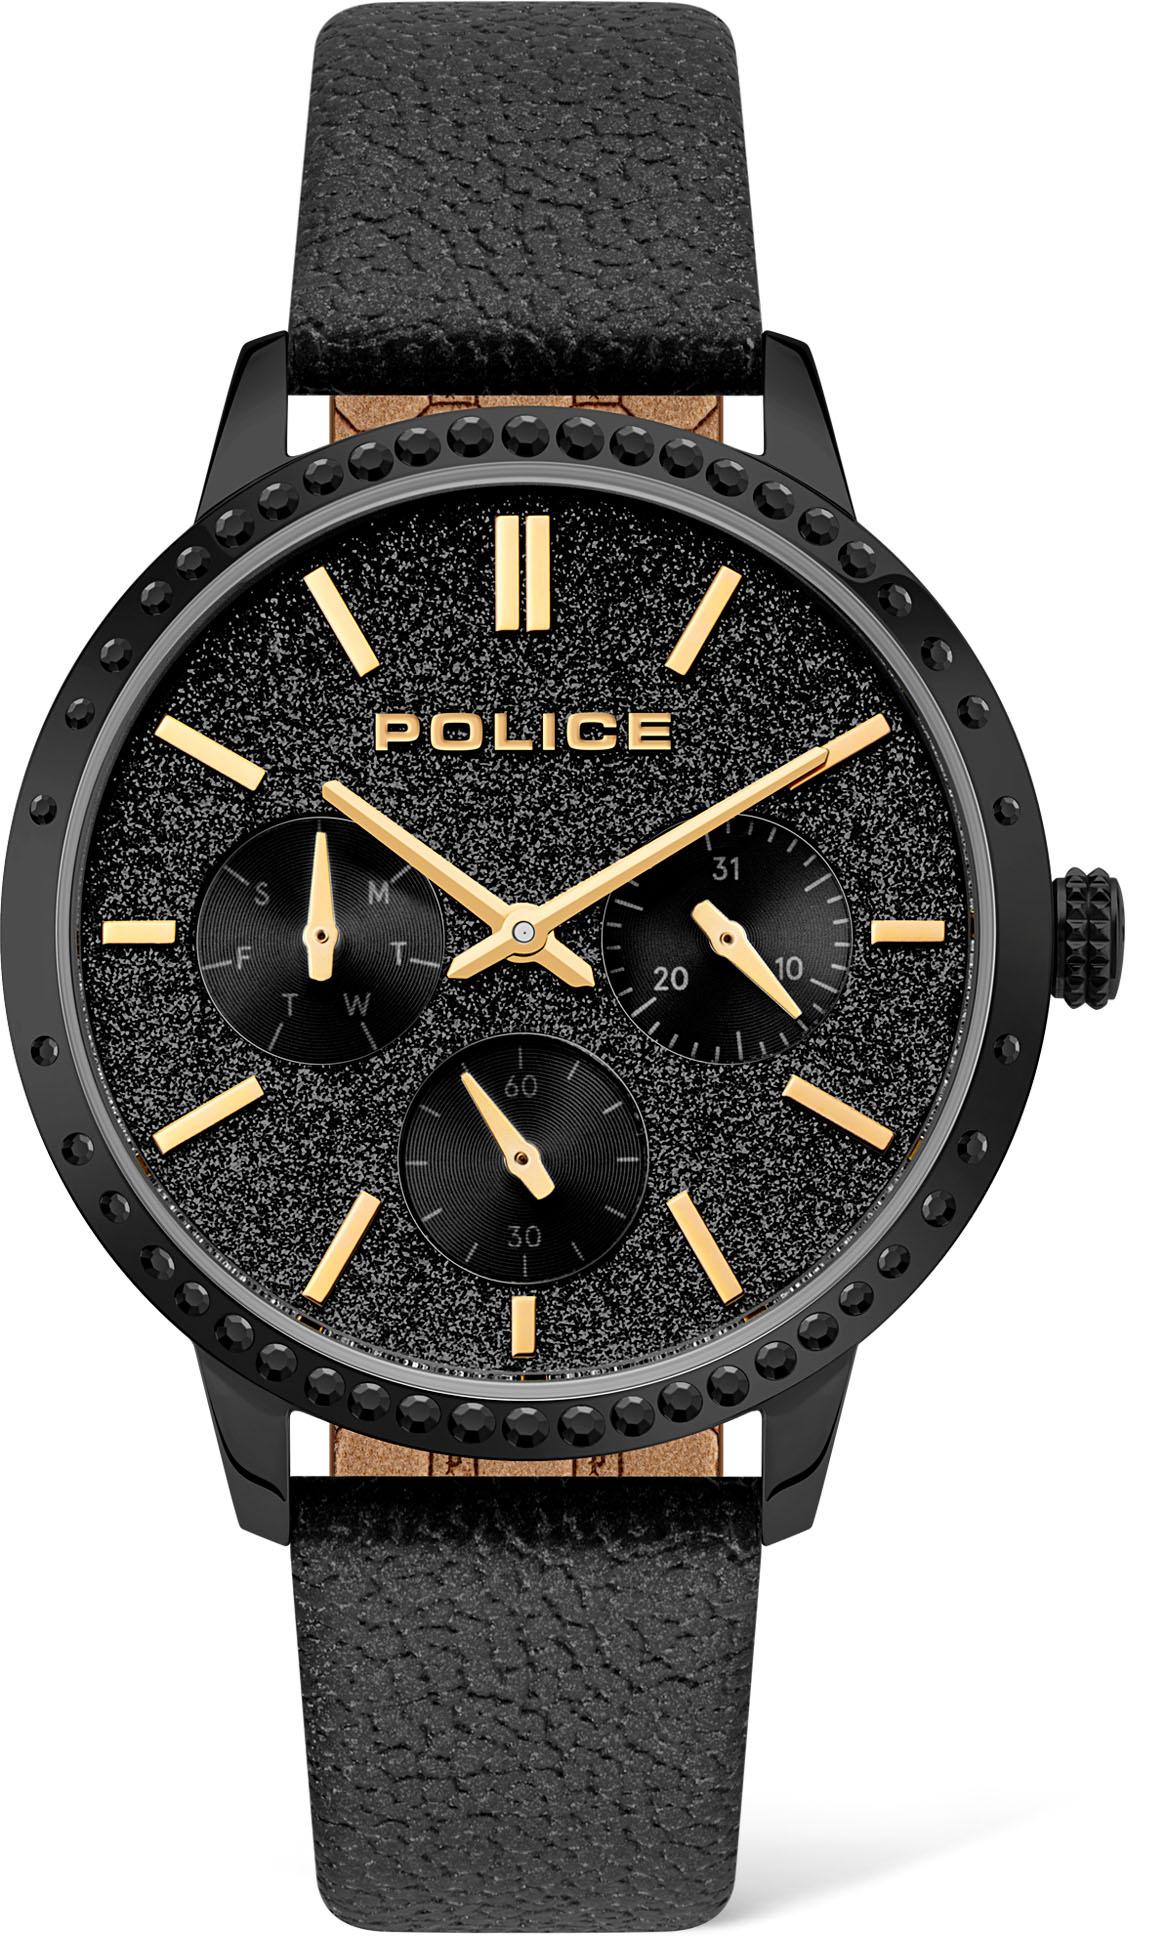 Police Multifunktionsuhr LUMBINI, PL16069MSB.02 günstig online kaufen